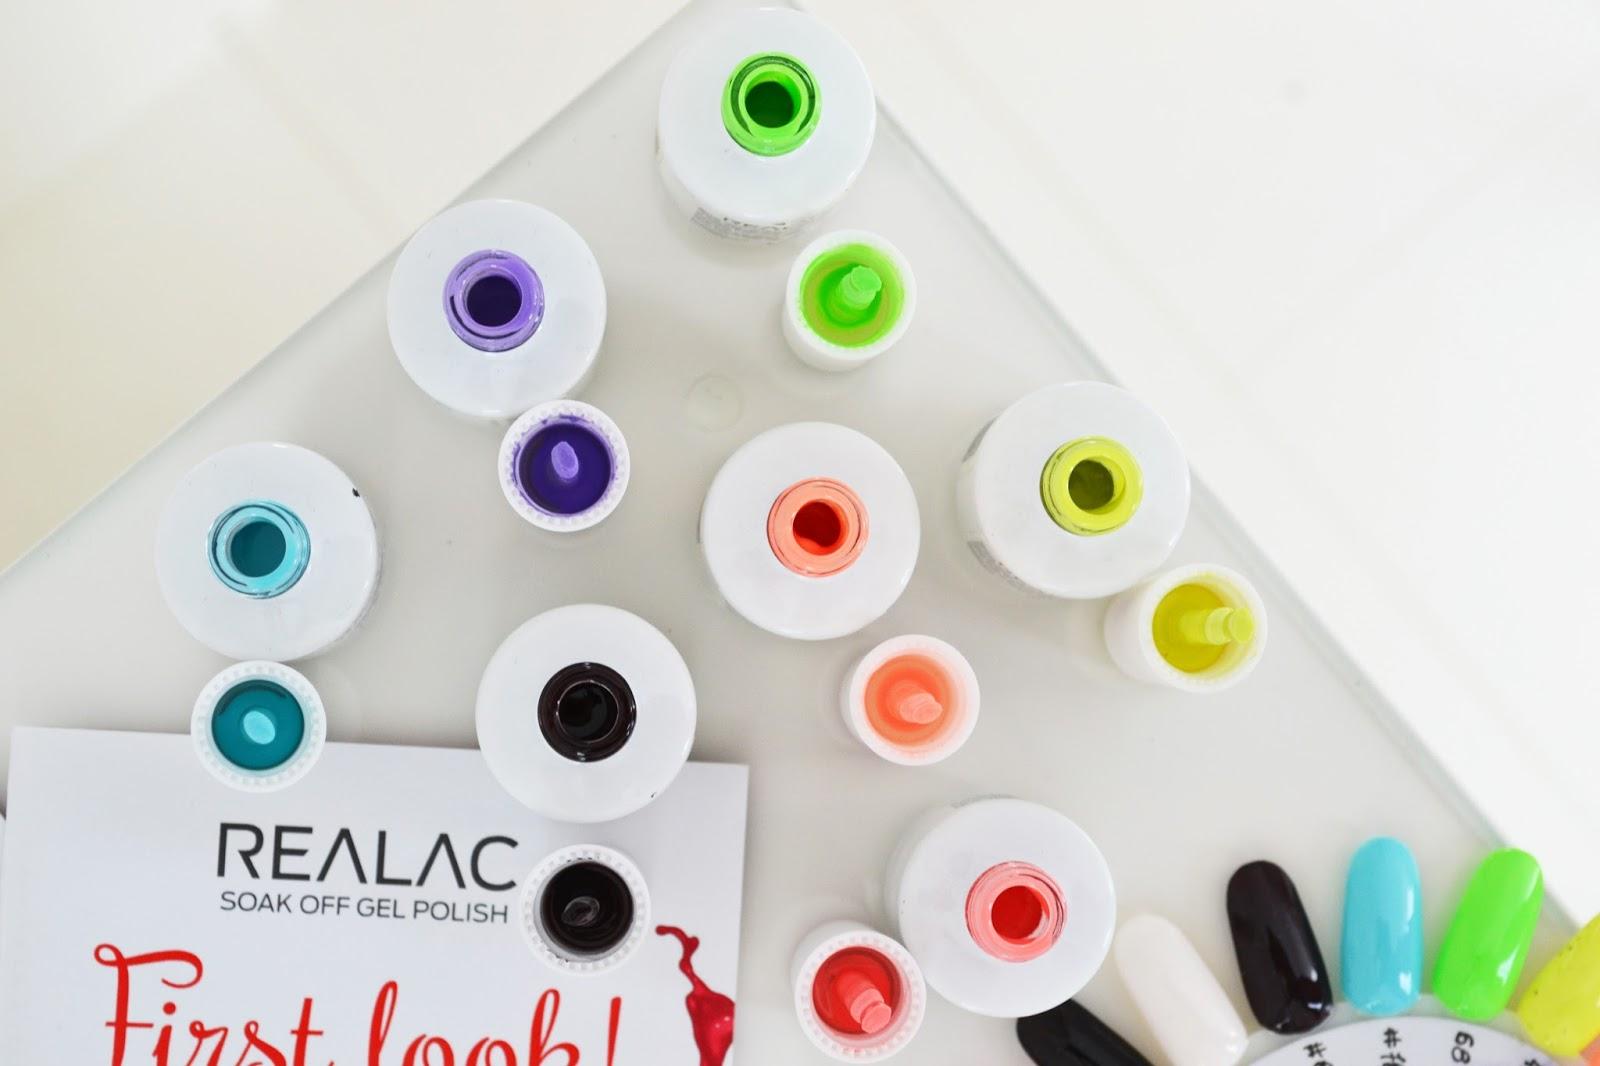 REALAC - LAKIERY HYBRYDOWE